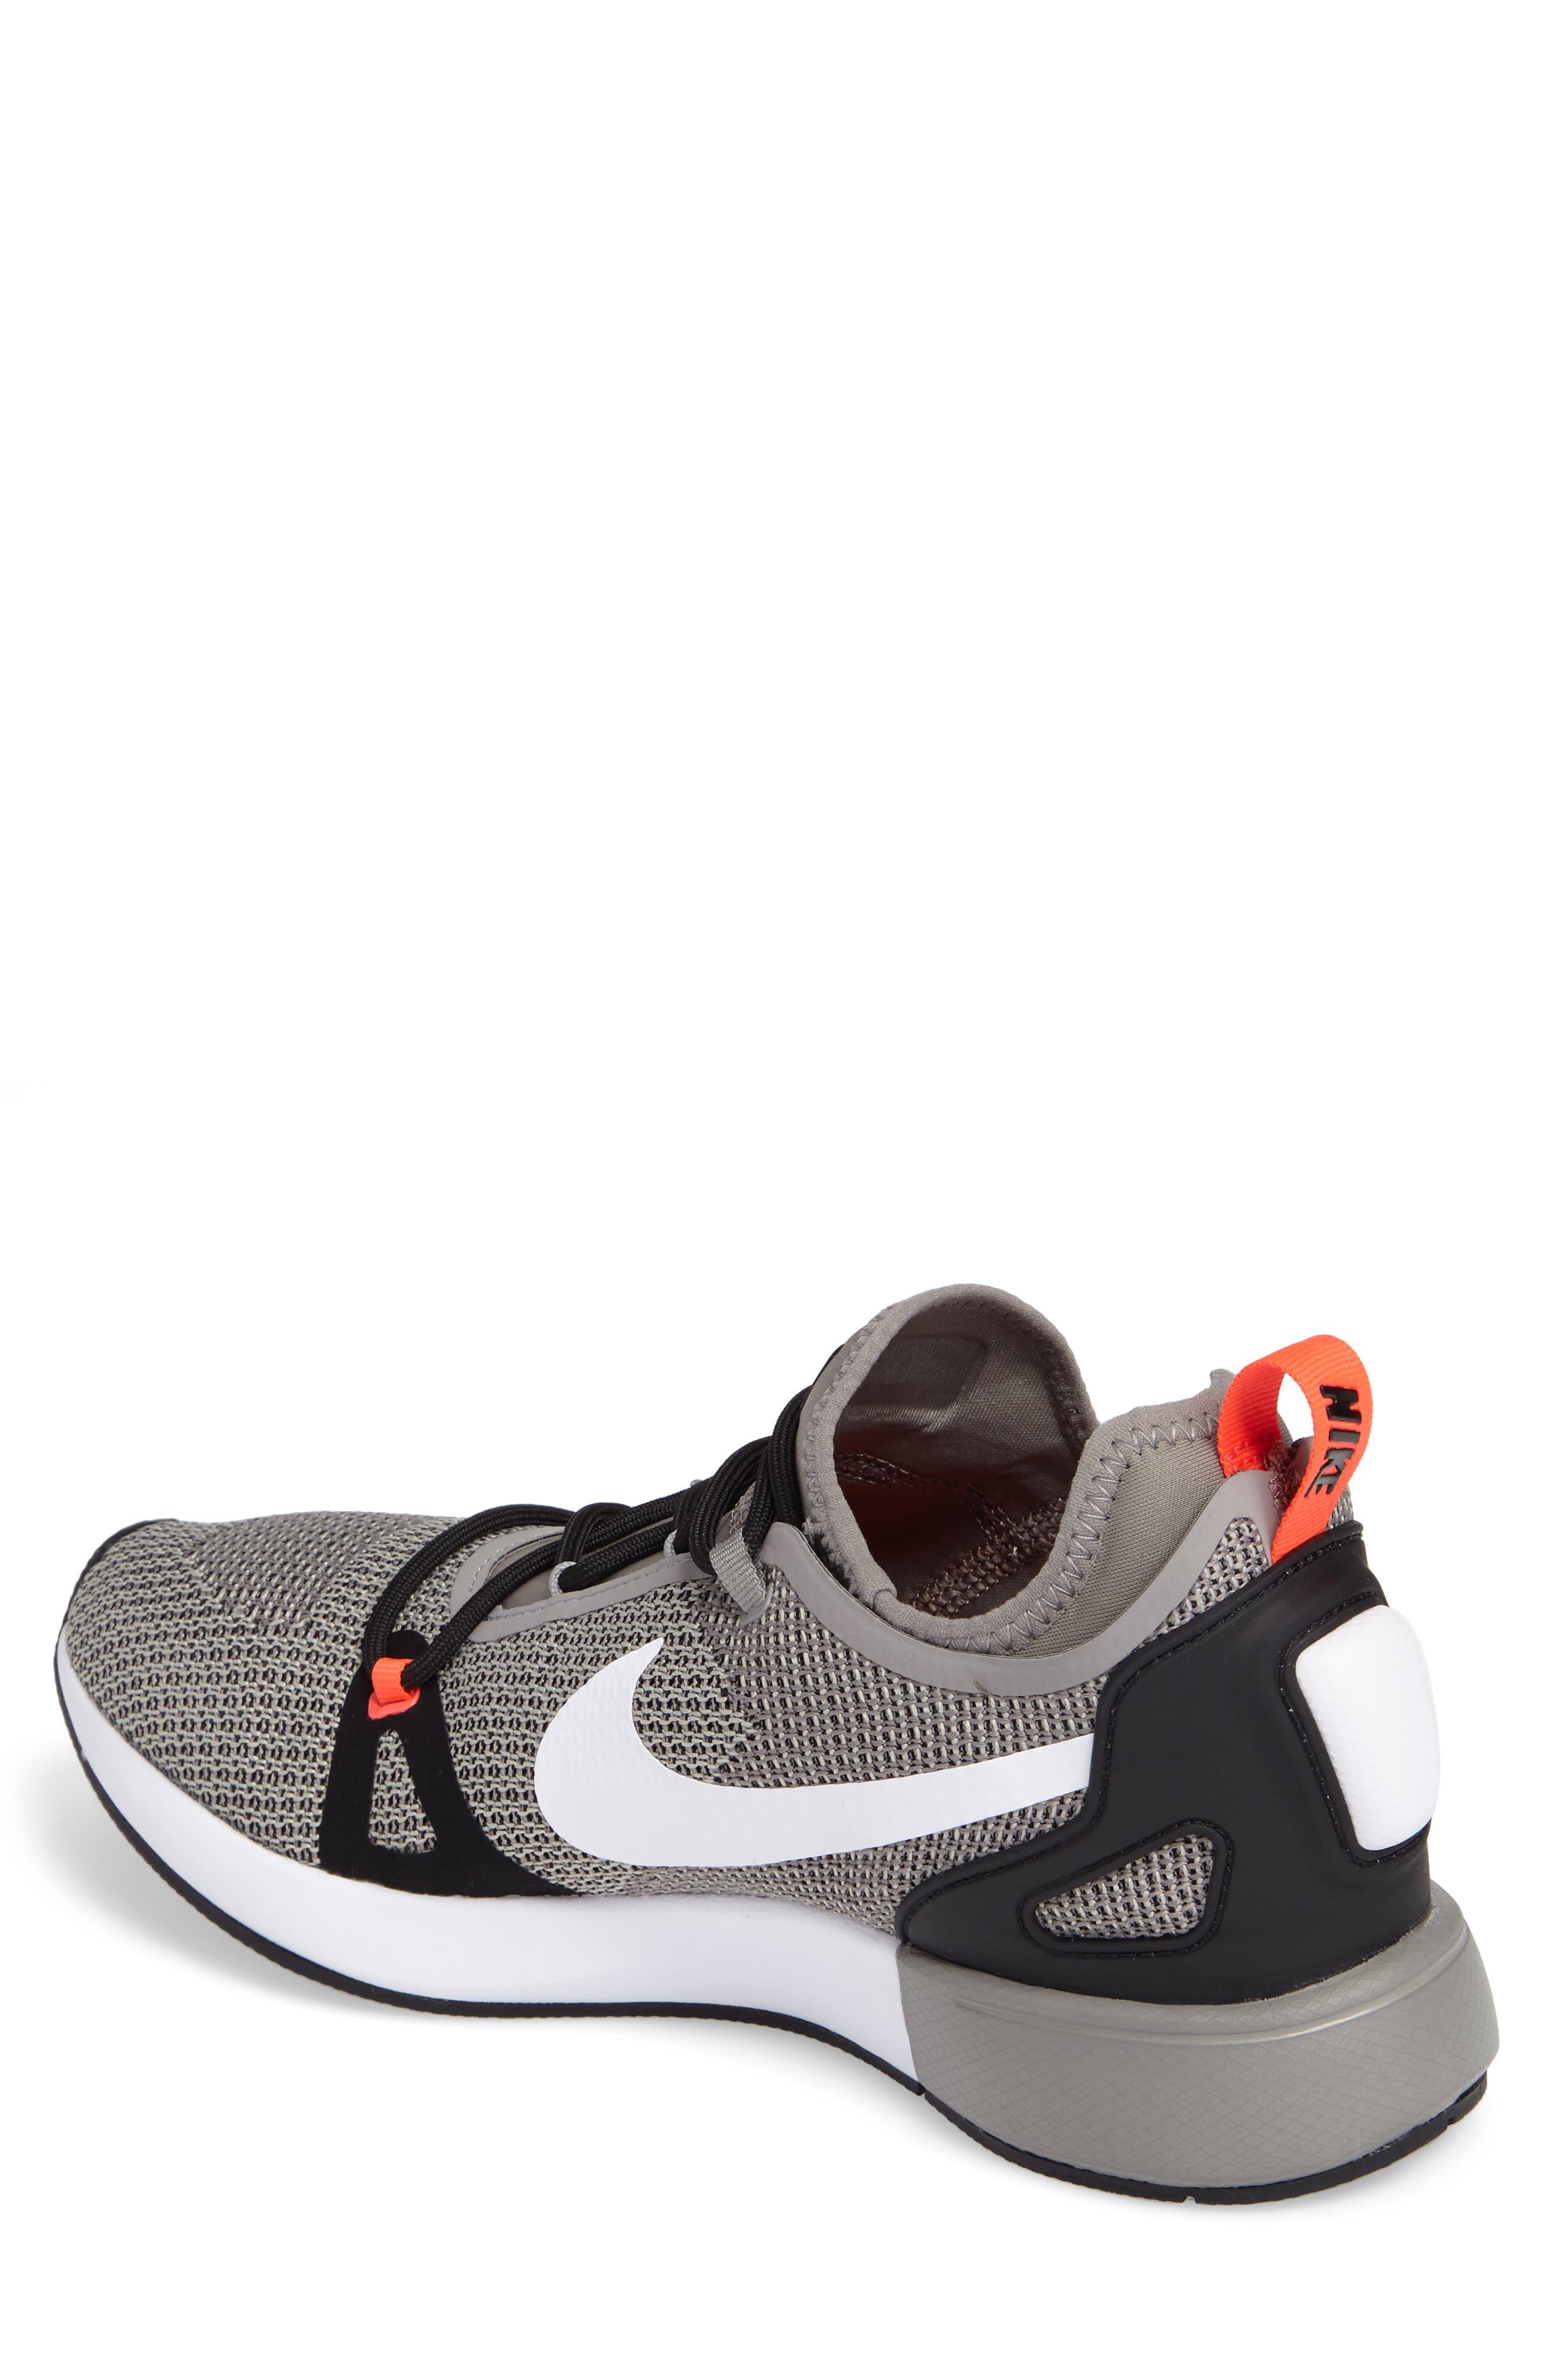 Alternate Image 2  - Nike Duelist Racer Sneaker (Men)